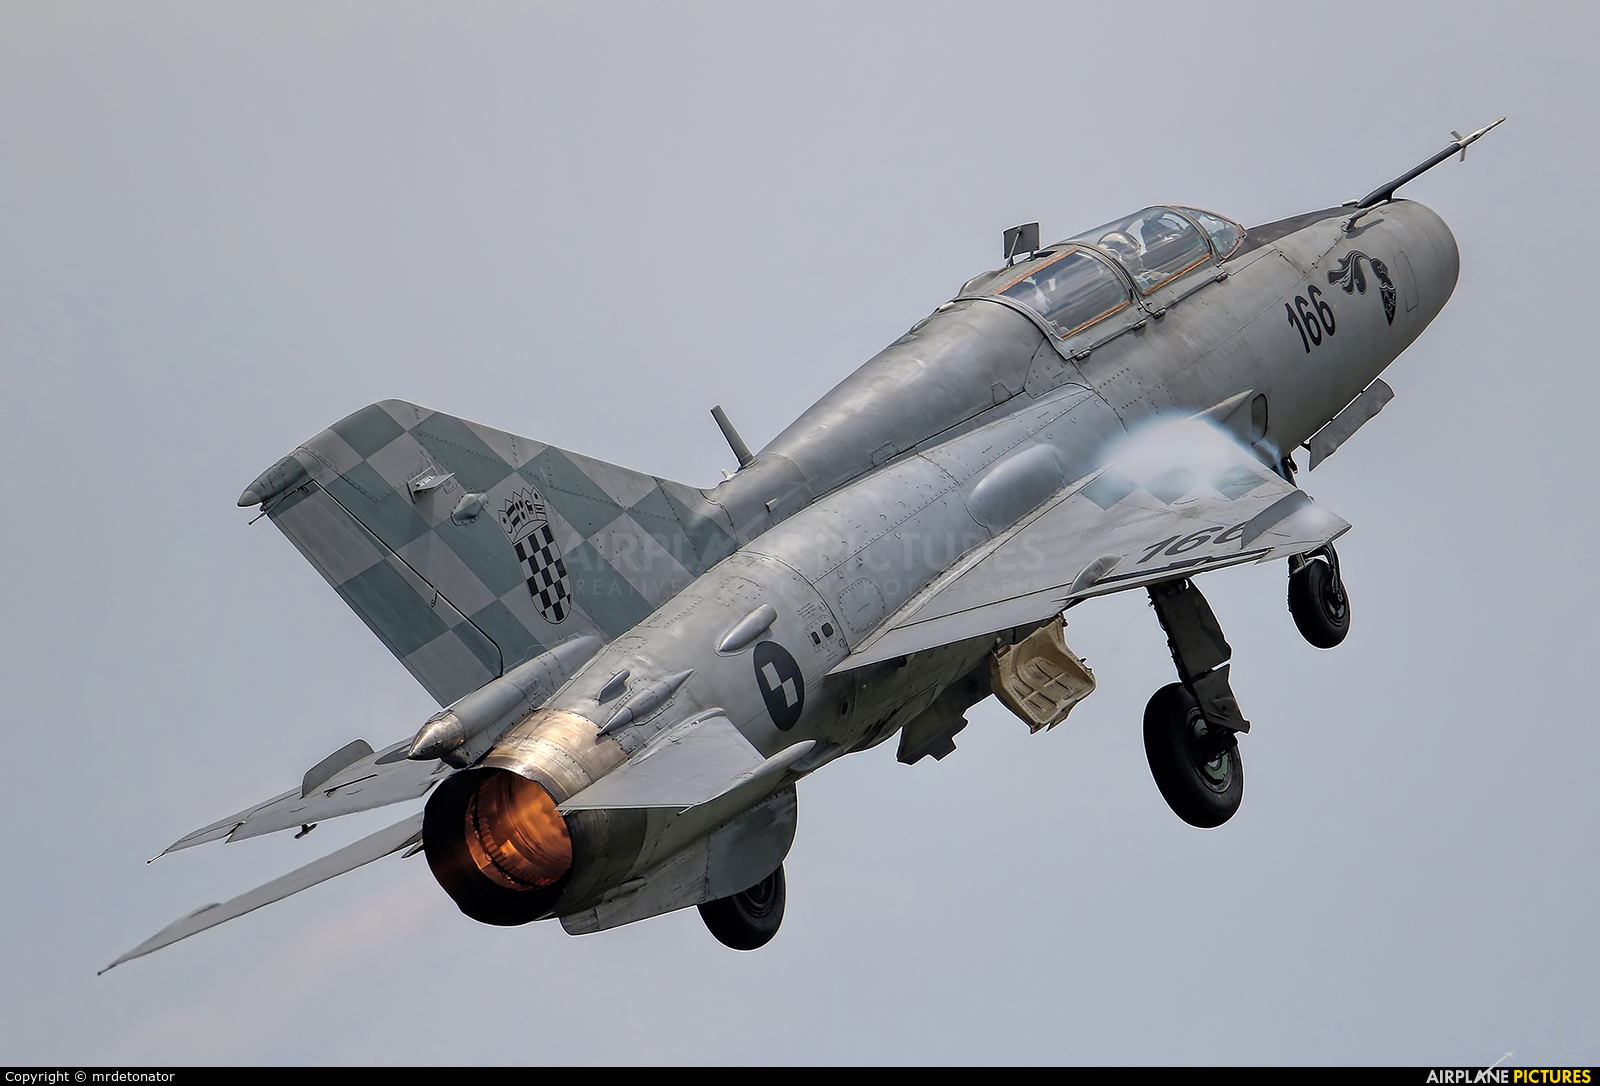 Croatia - Air Force 166 aircraft at Varazdin